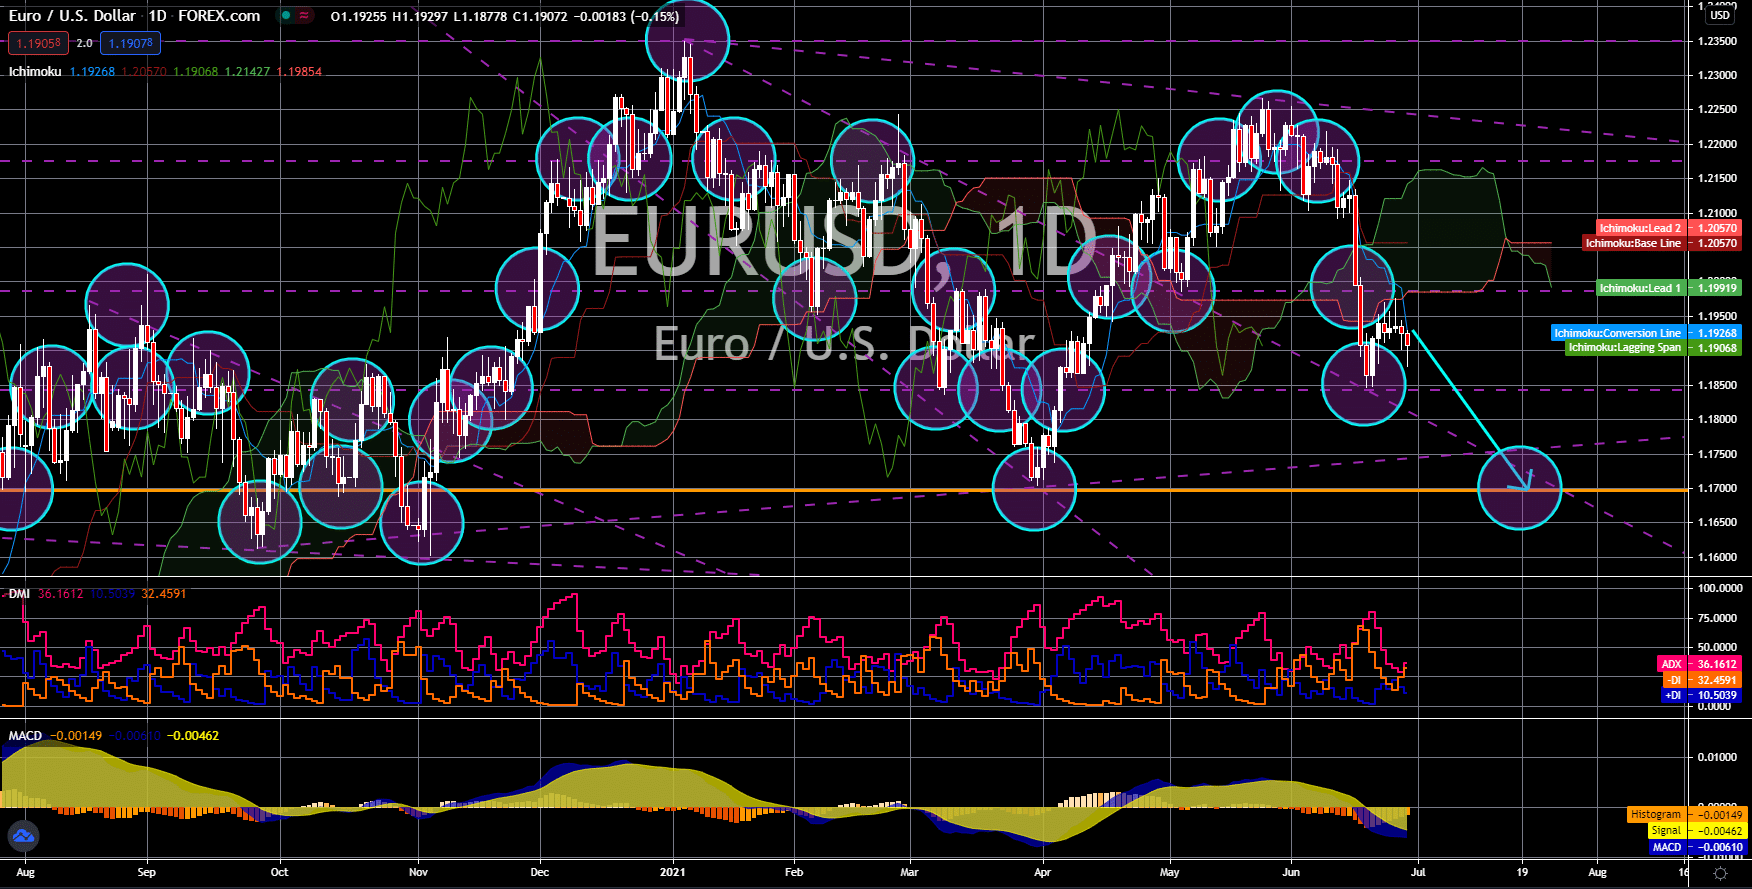 FinanceBrokerage - Notícias do mercado: gráfico EUR / USD